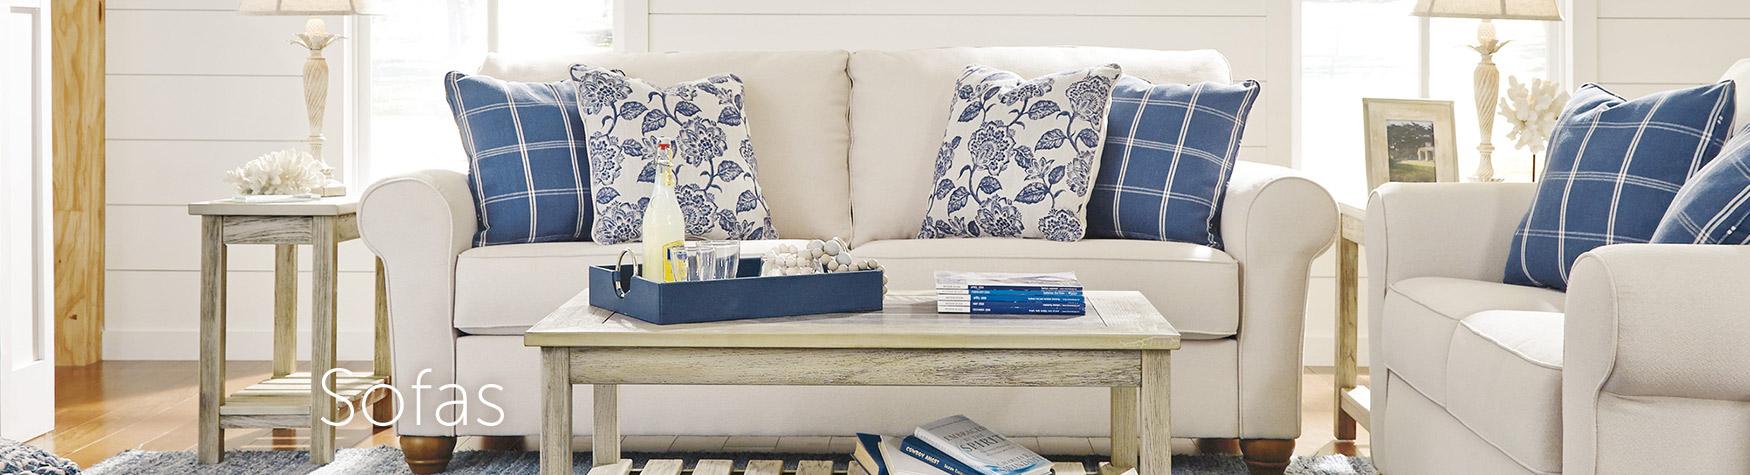 Living Room - Sofas from JaxCo Furniture in Jacksonville, FL